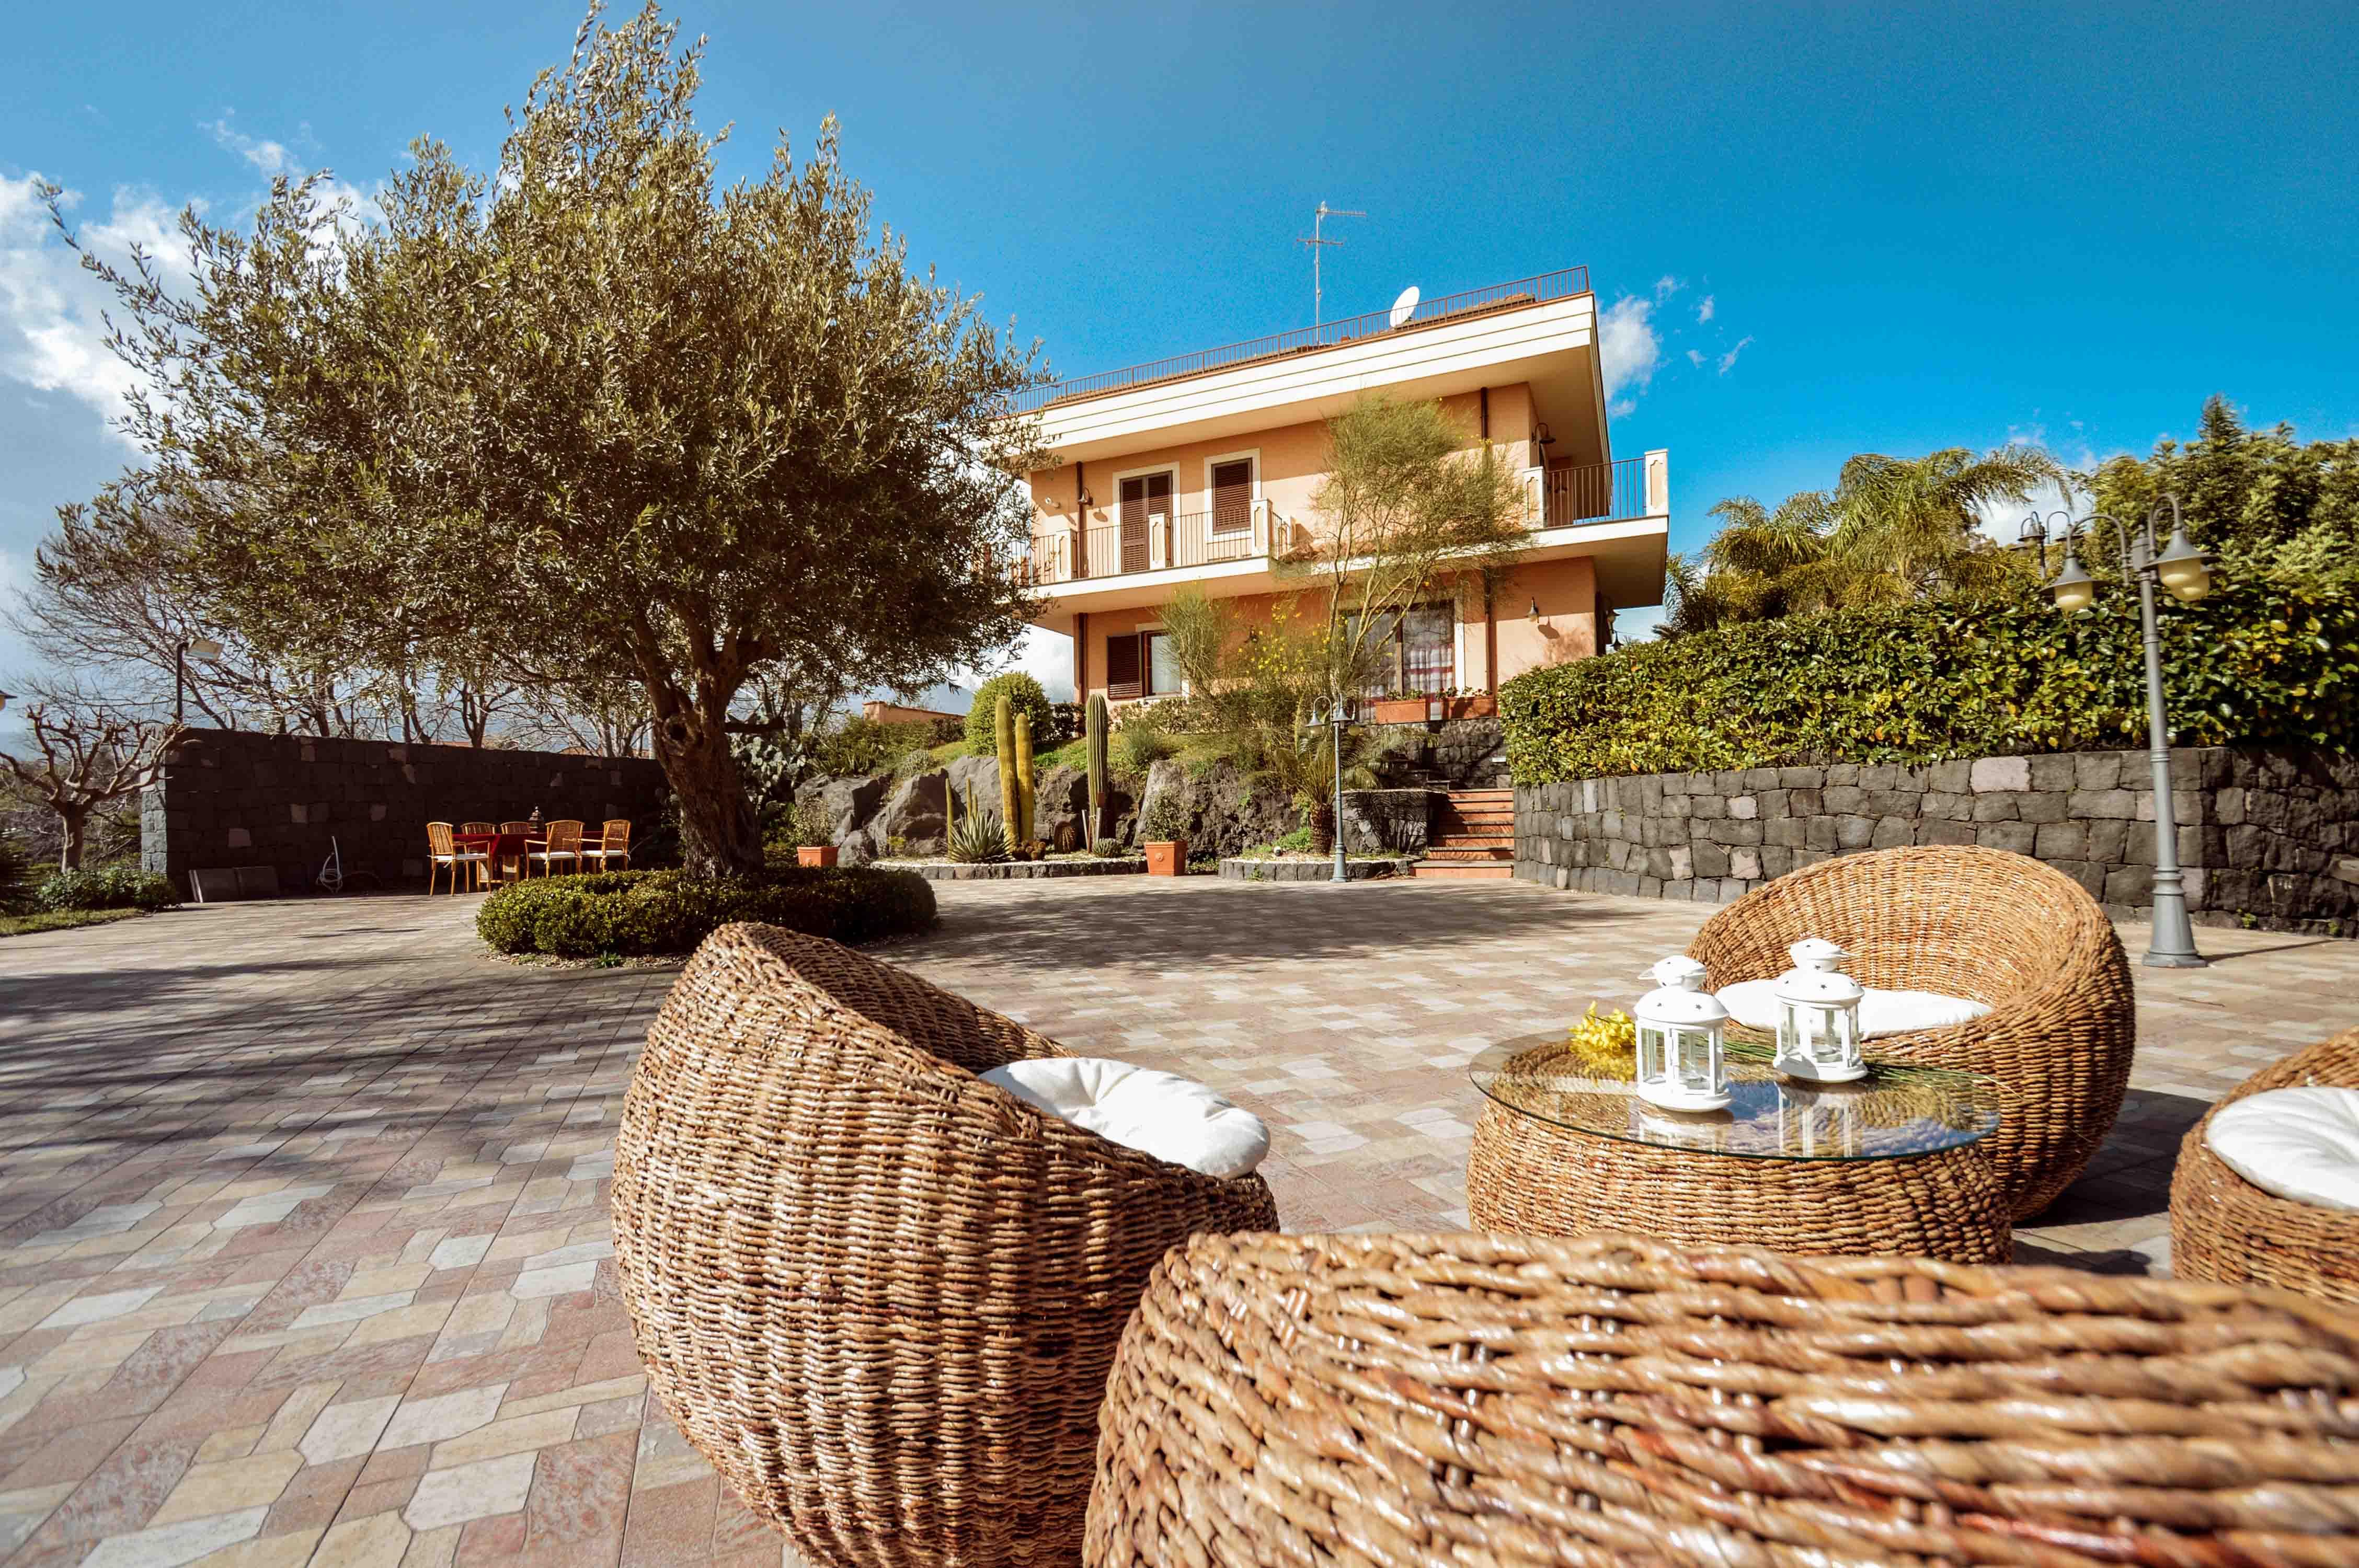 Ferienhaus Villa Giada- enjoys views of Mount Etna and the sea, a true paradise (2383441), Acireale, Catania, Sizilien, Italien, Bild 6